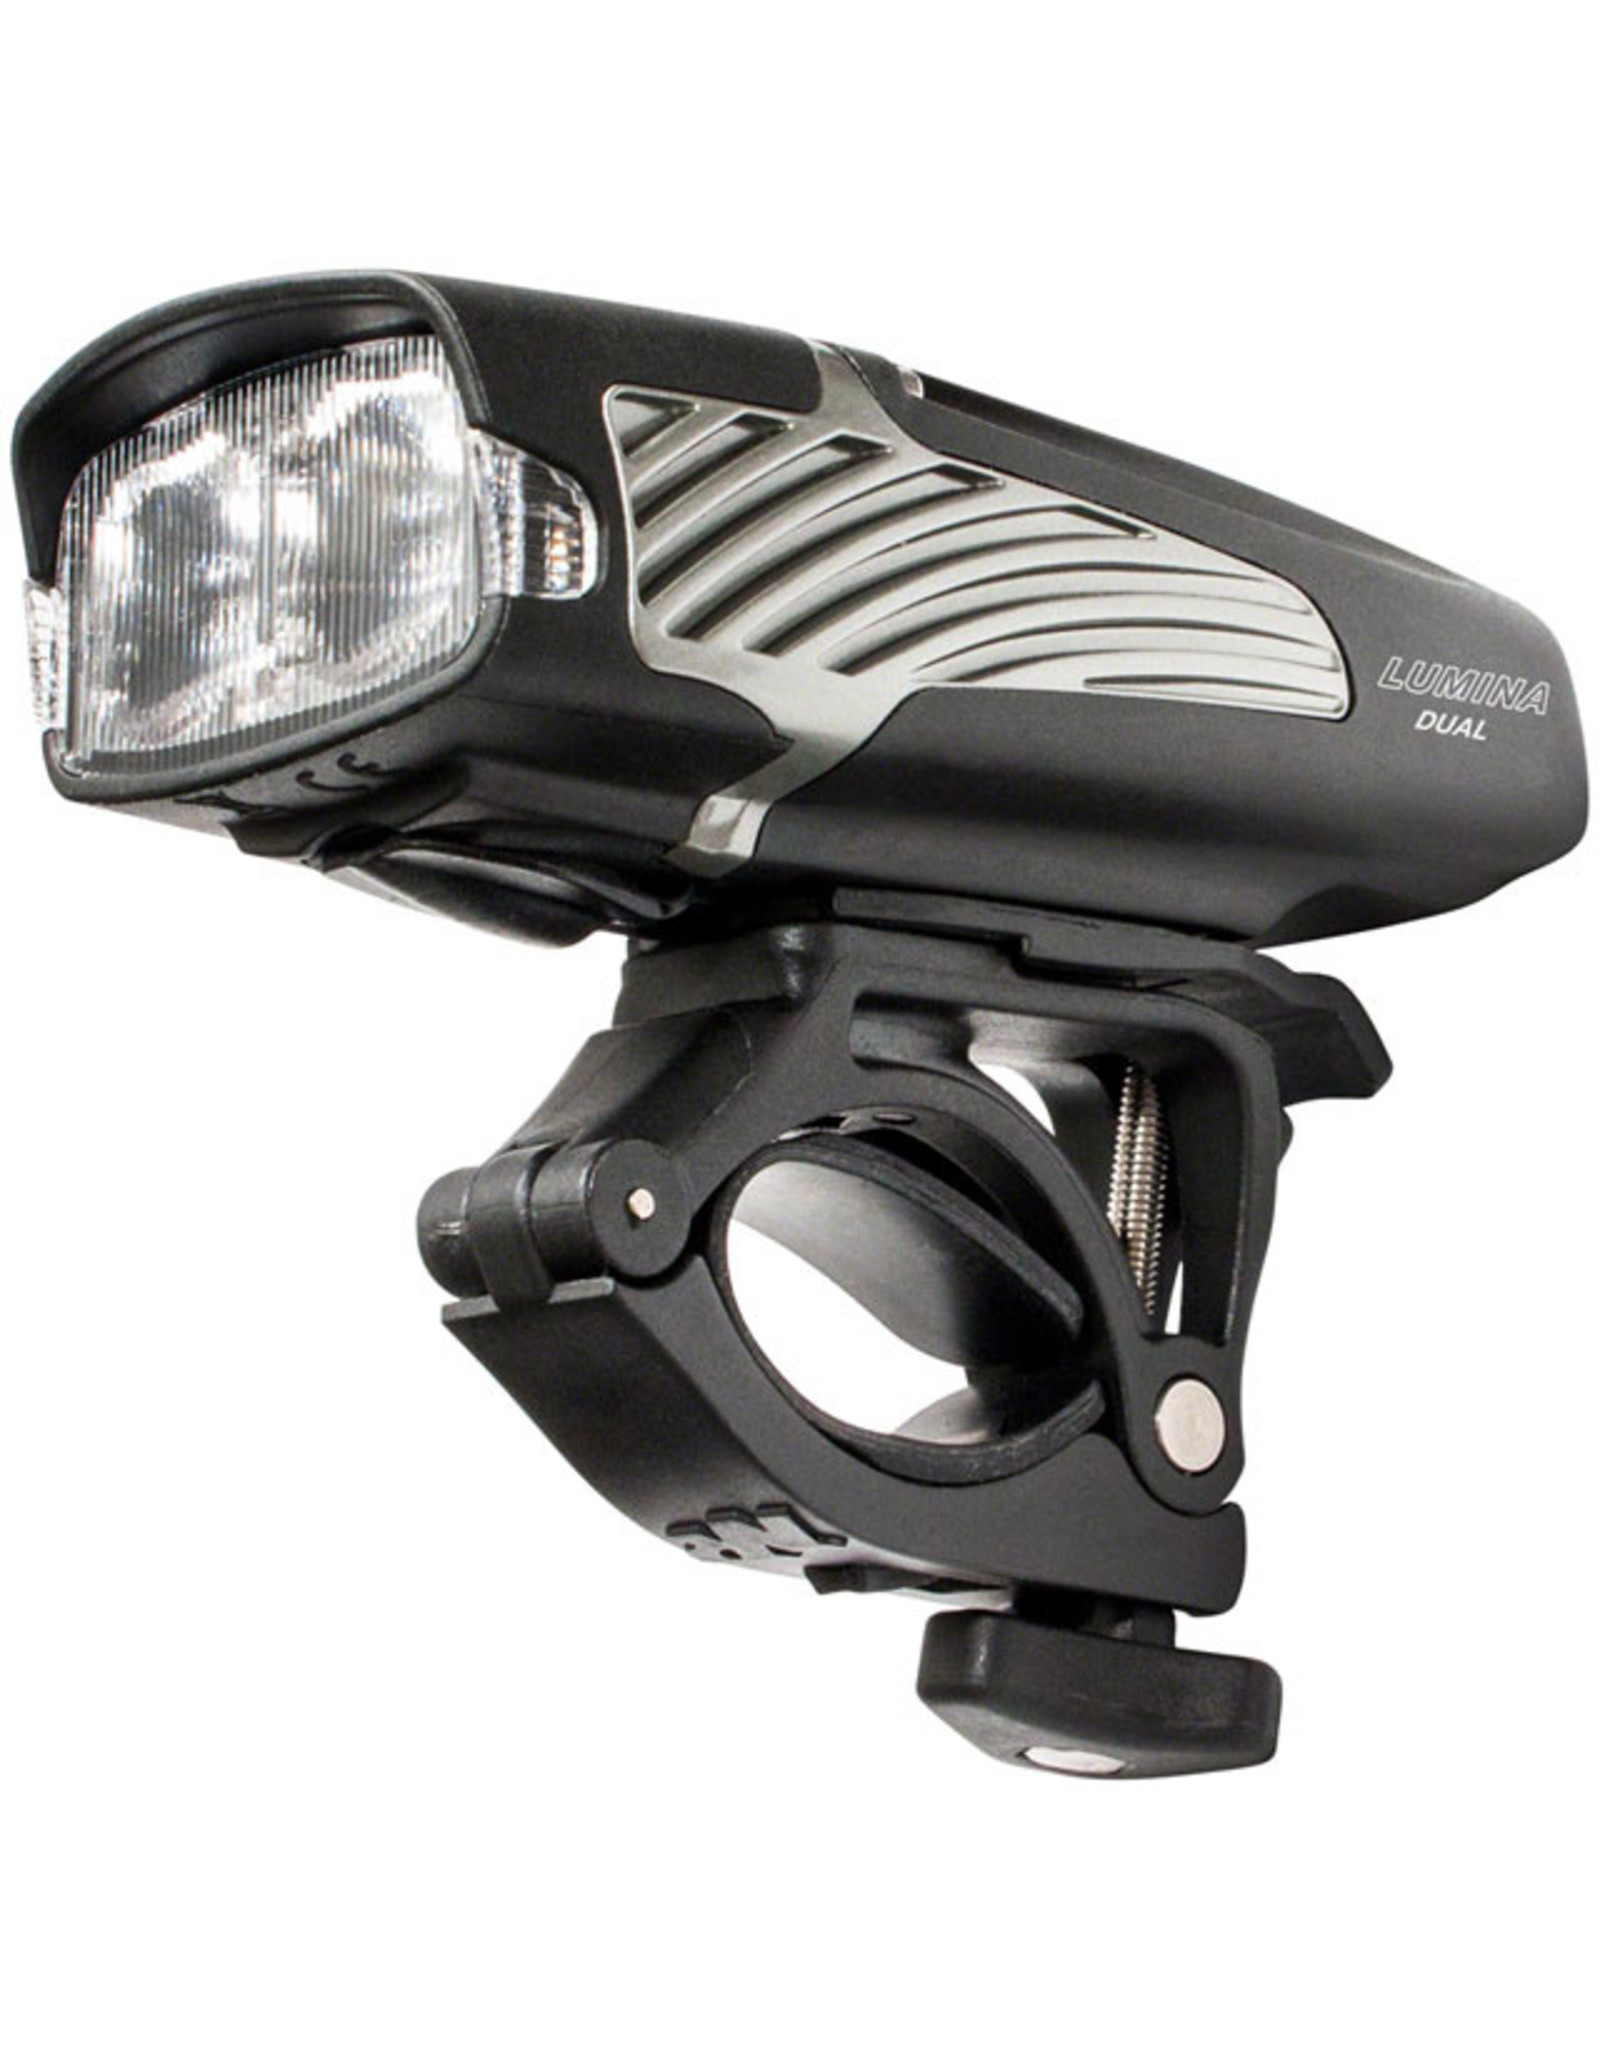 NiteRider Lumina Dual 1800 Headlight